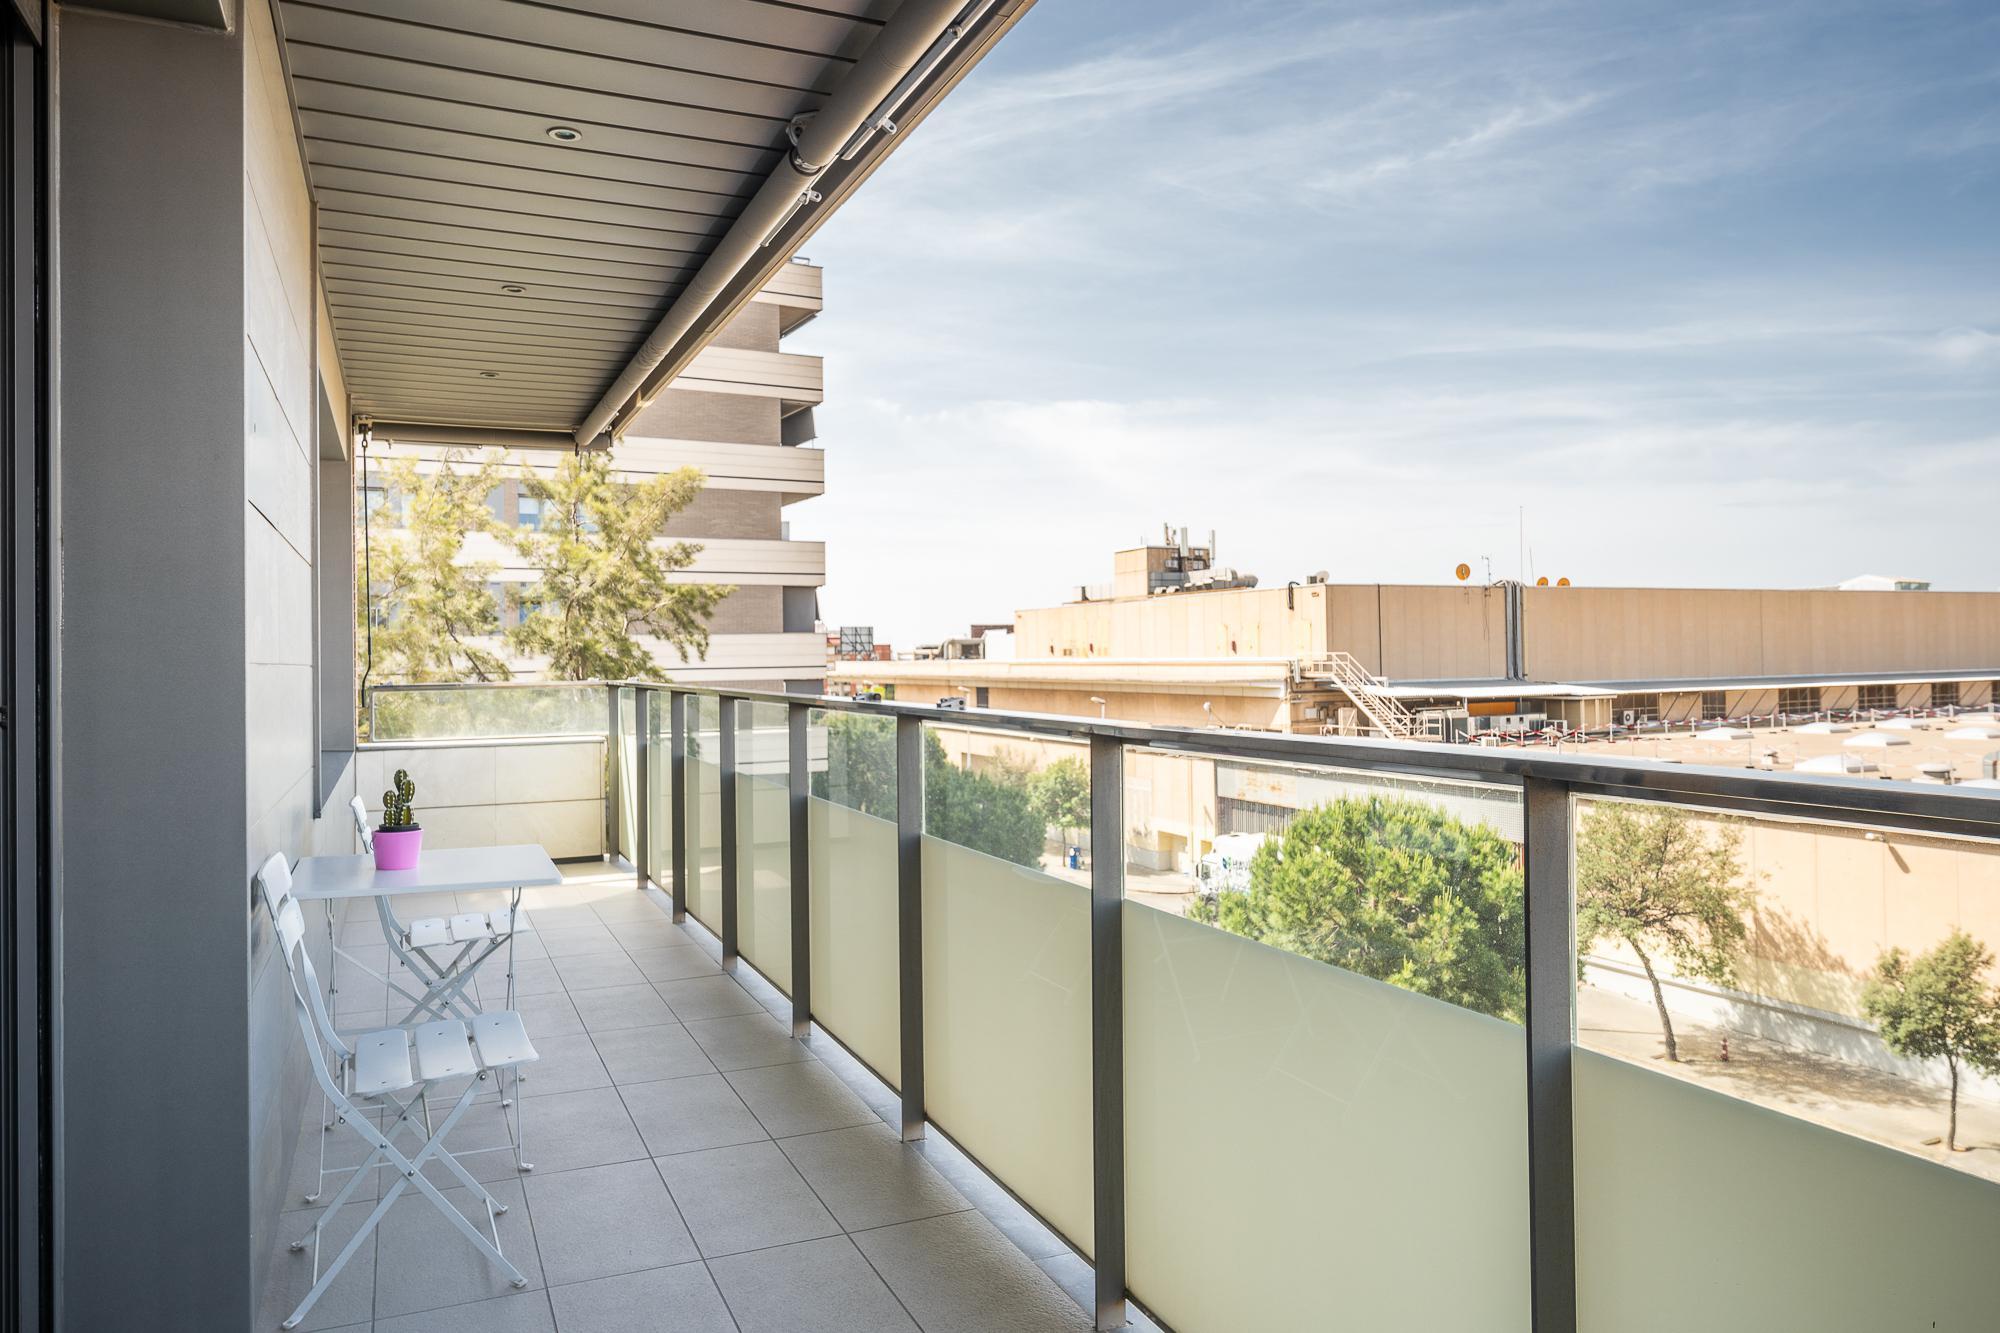 Imagen 1 Piso en venta en Cornellà De Llobregat / Junto centro comercial Eroski